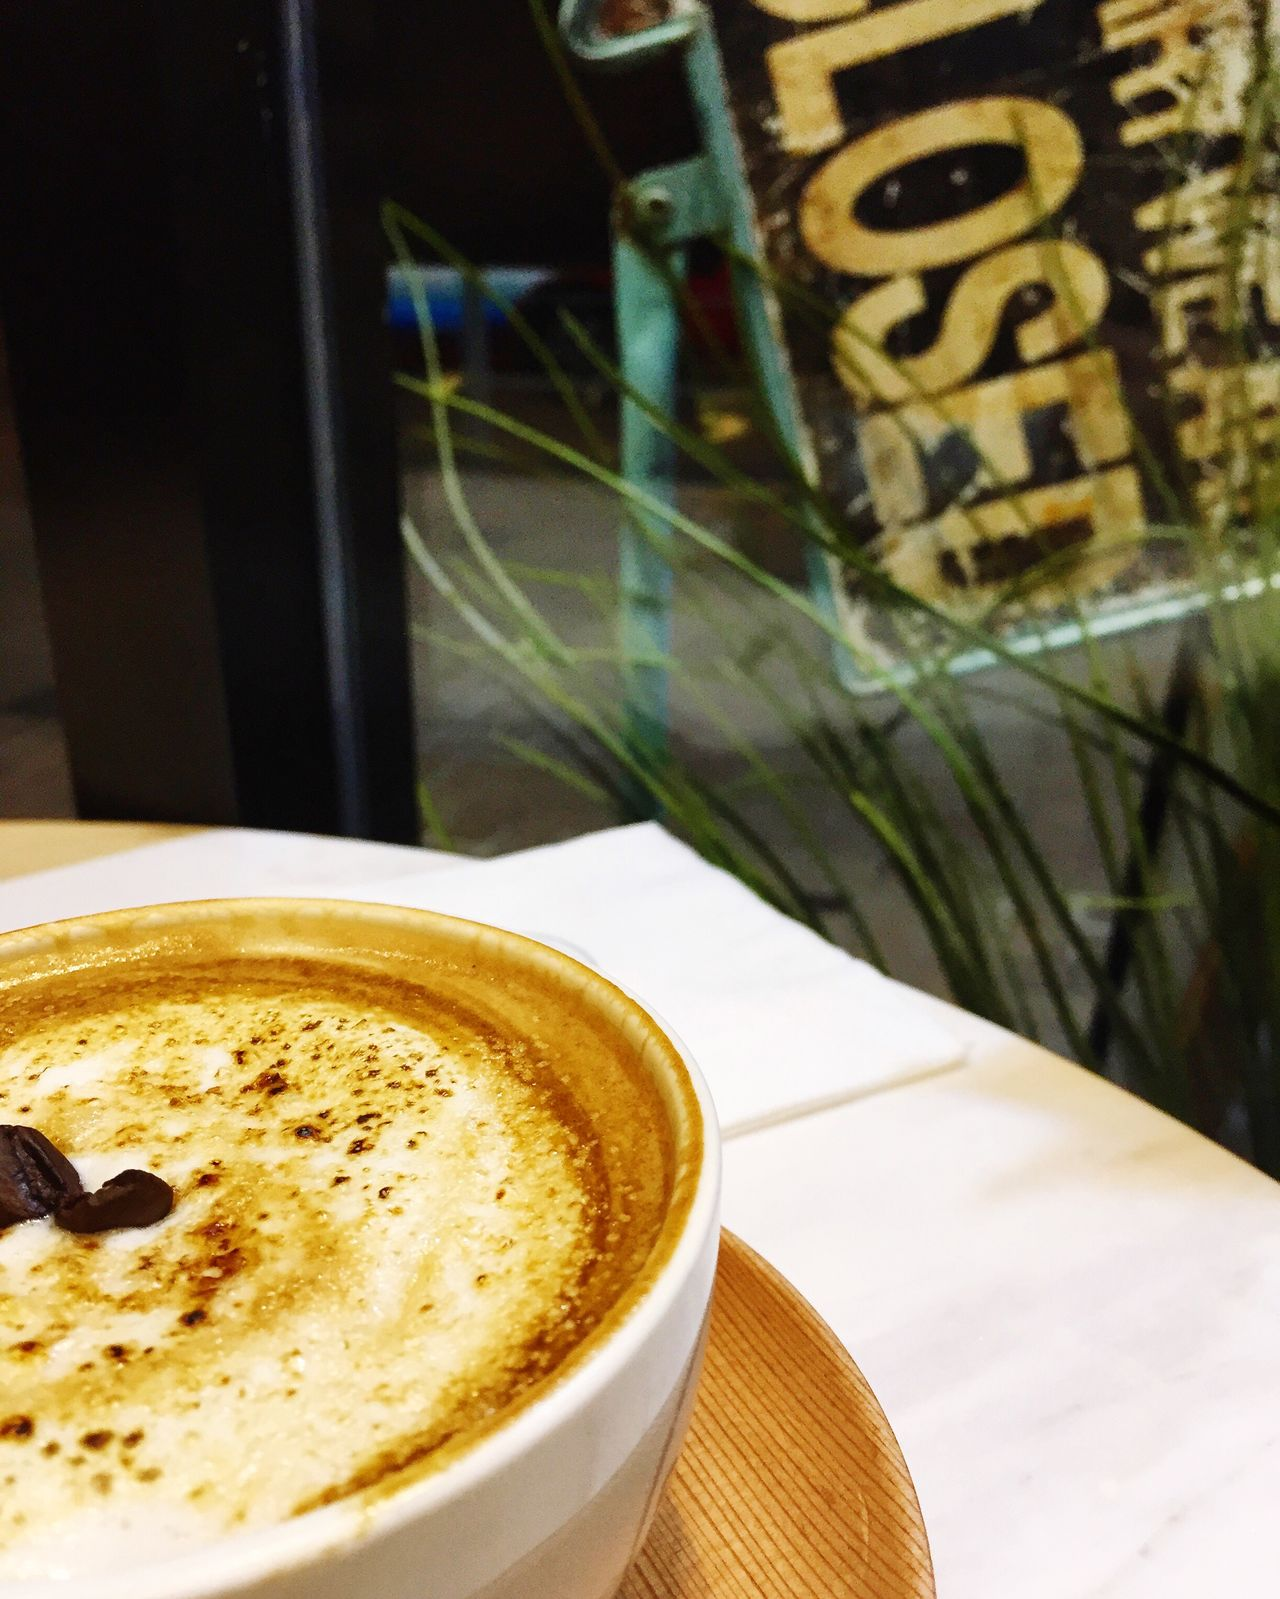 Coffee Break Closed Shut Down Mindful Self